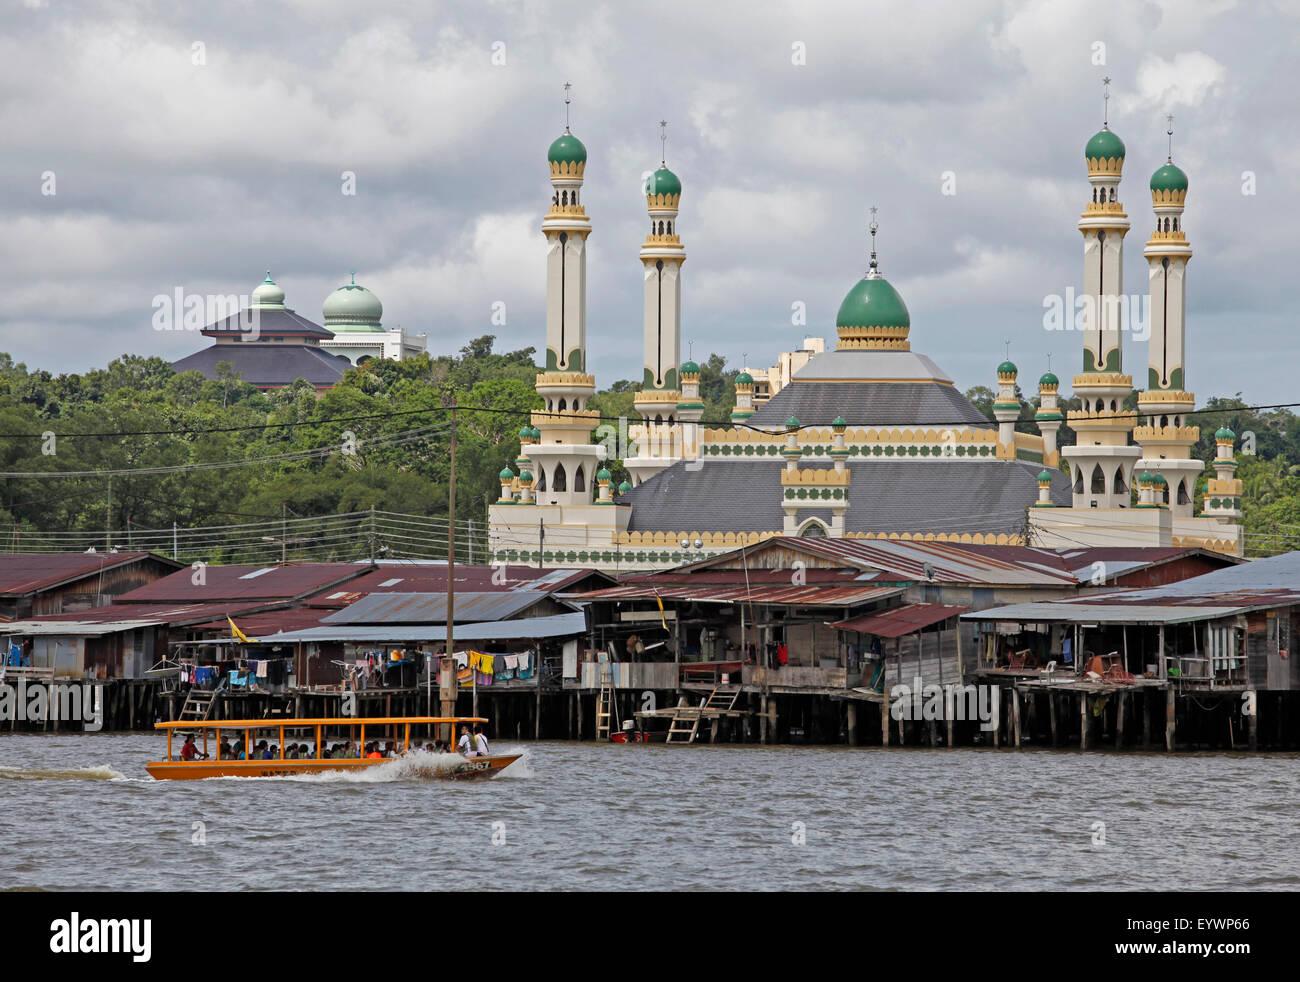 Tourist boat past the Jame' Asr Hassanil Bolkiah mosque in Bandar Seri Begawan, Brunei, Southeast Asia, Asia - Stock Image